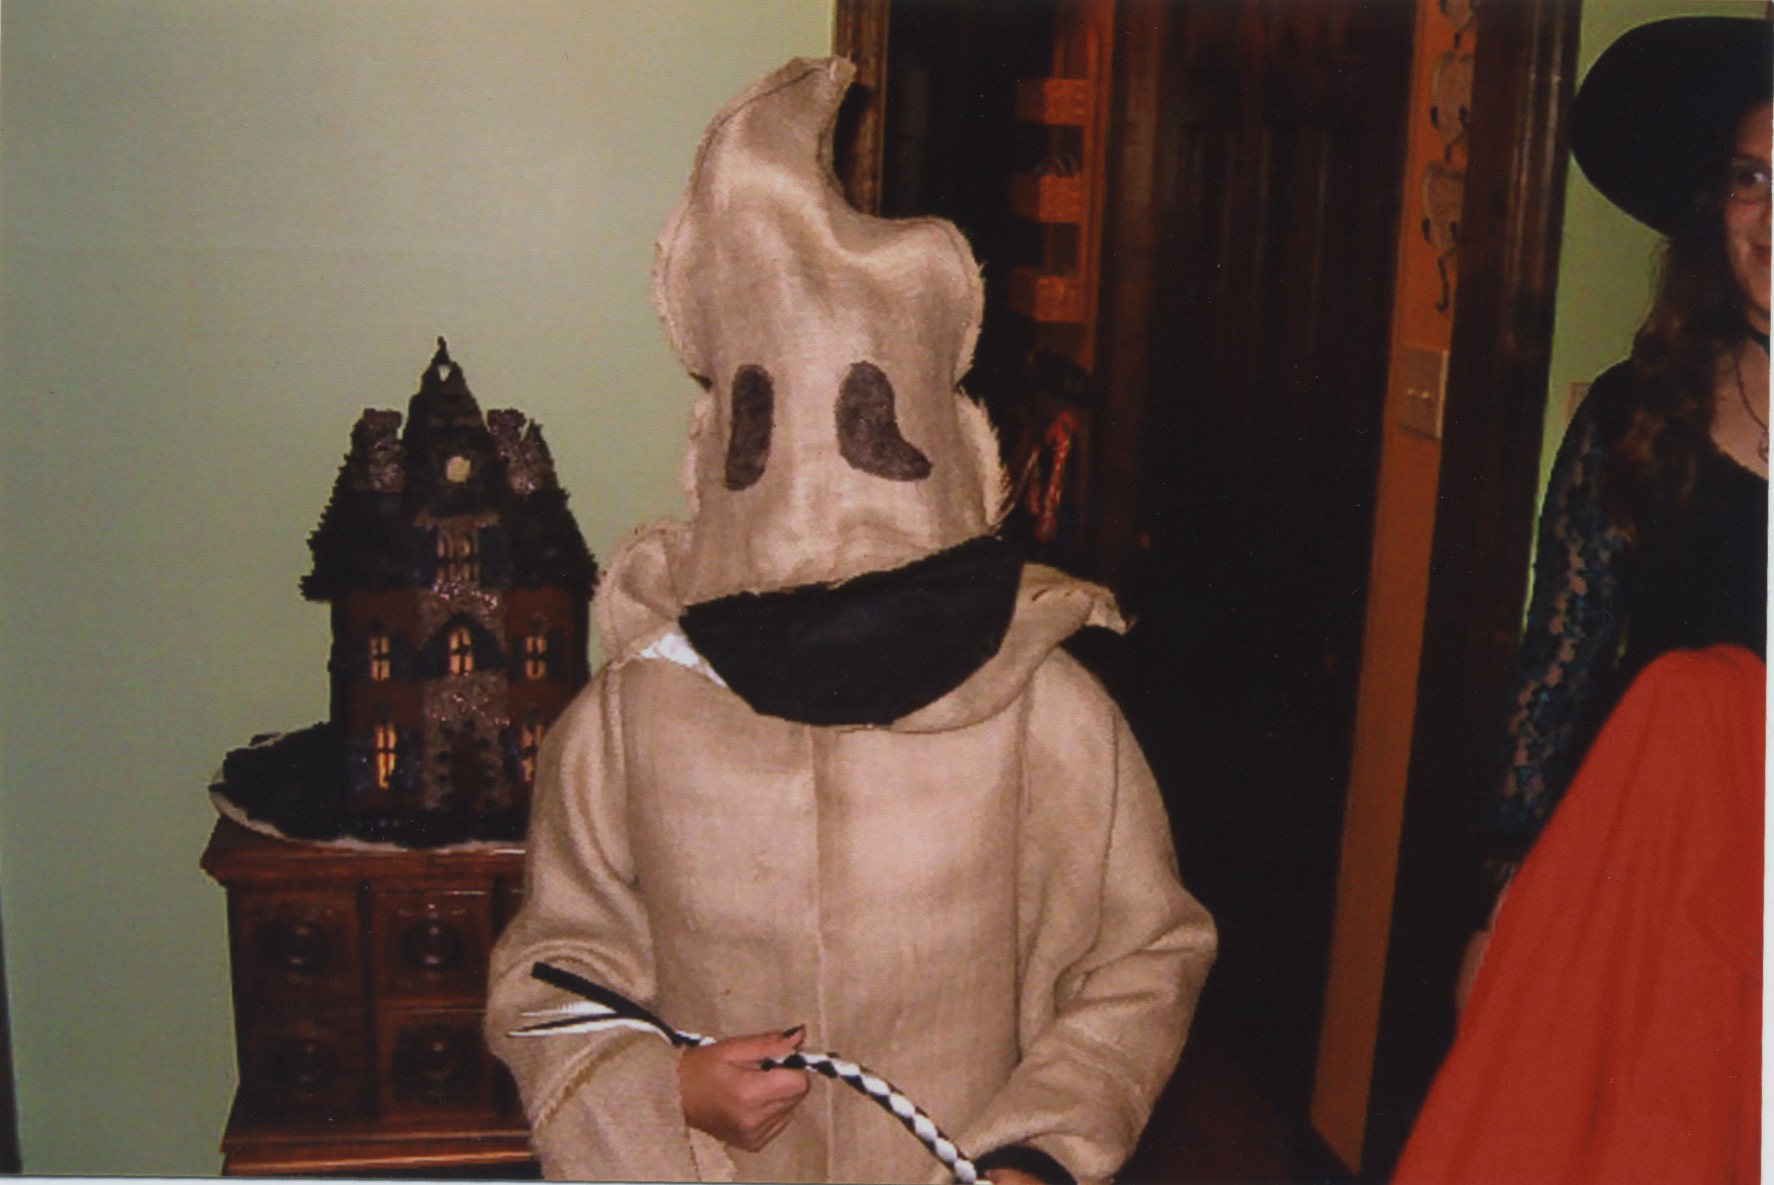 Oggie Boogie Haloween Costume